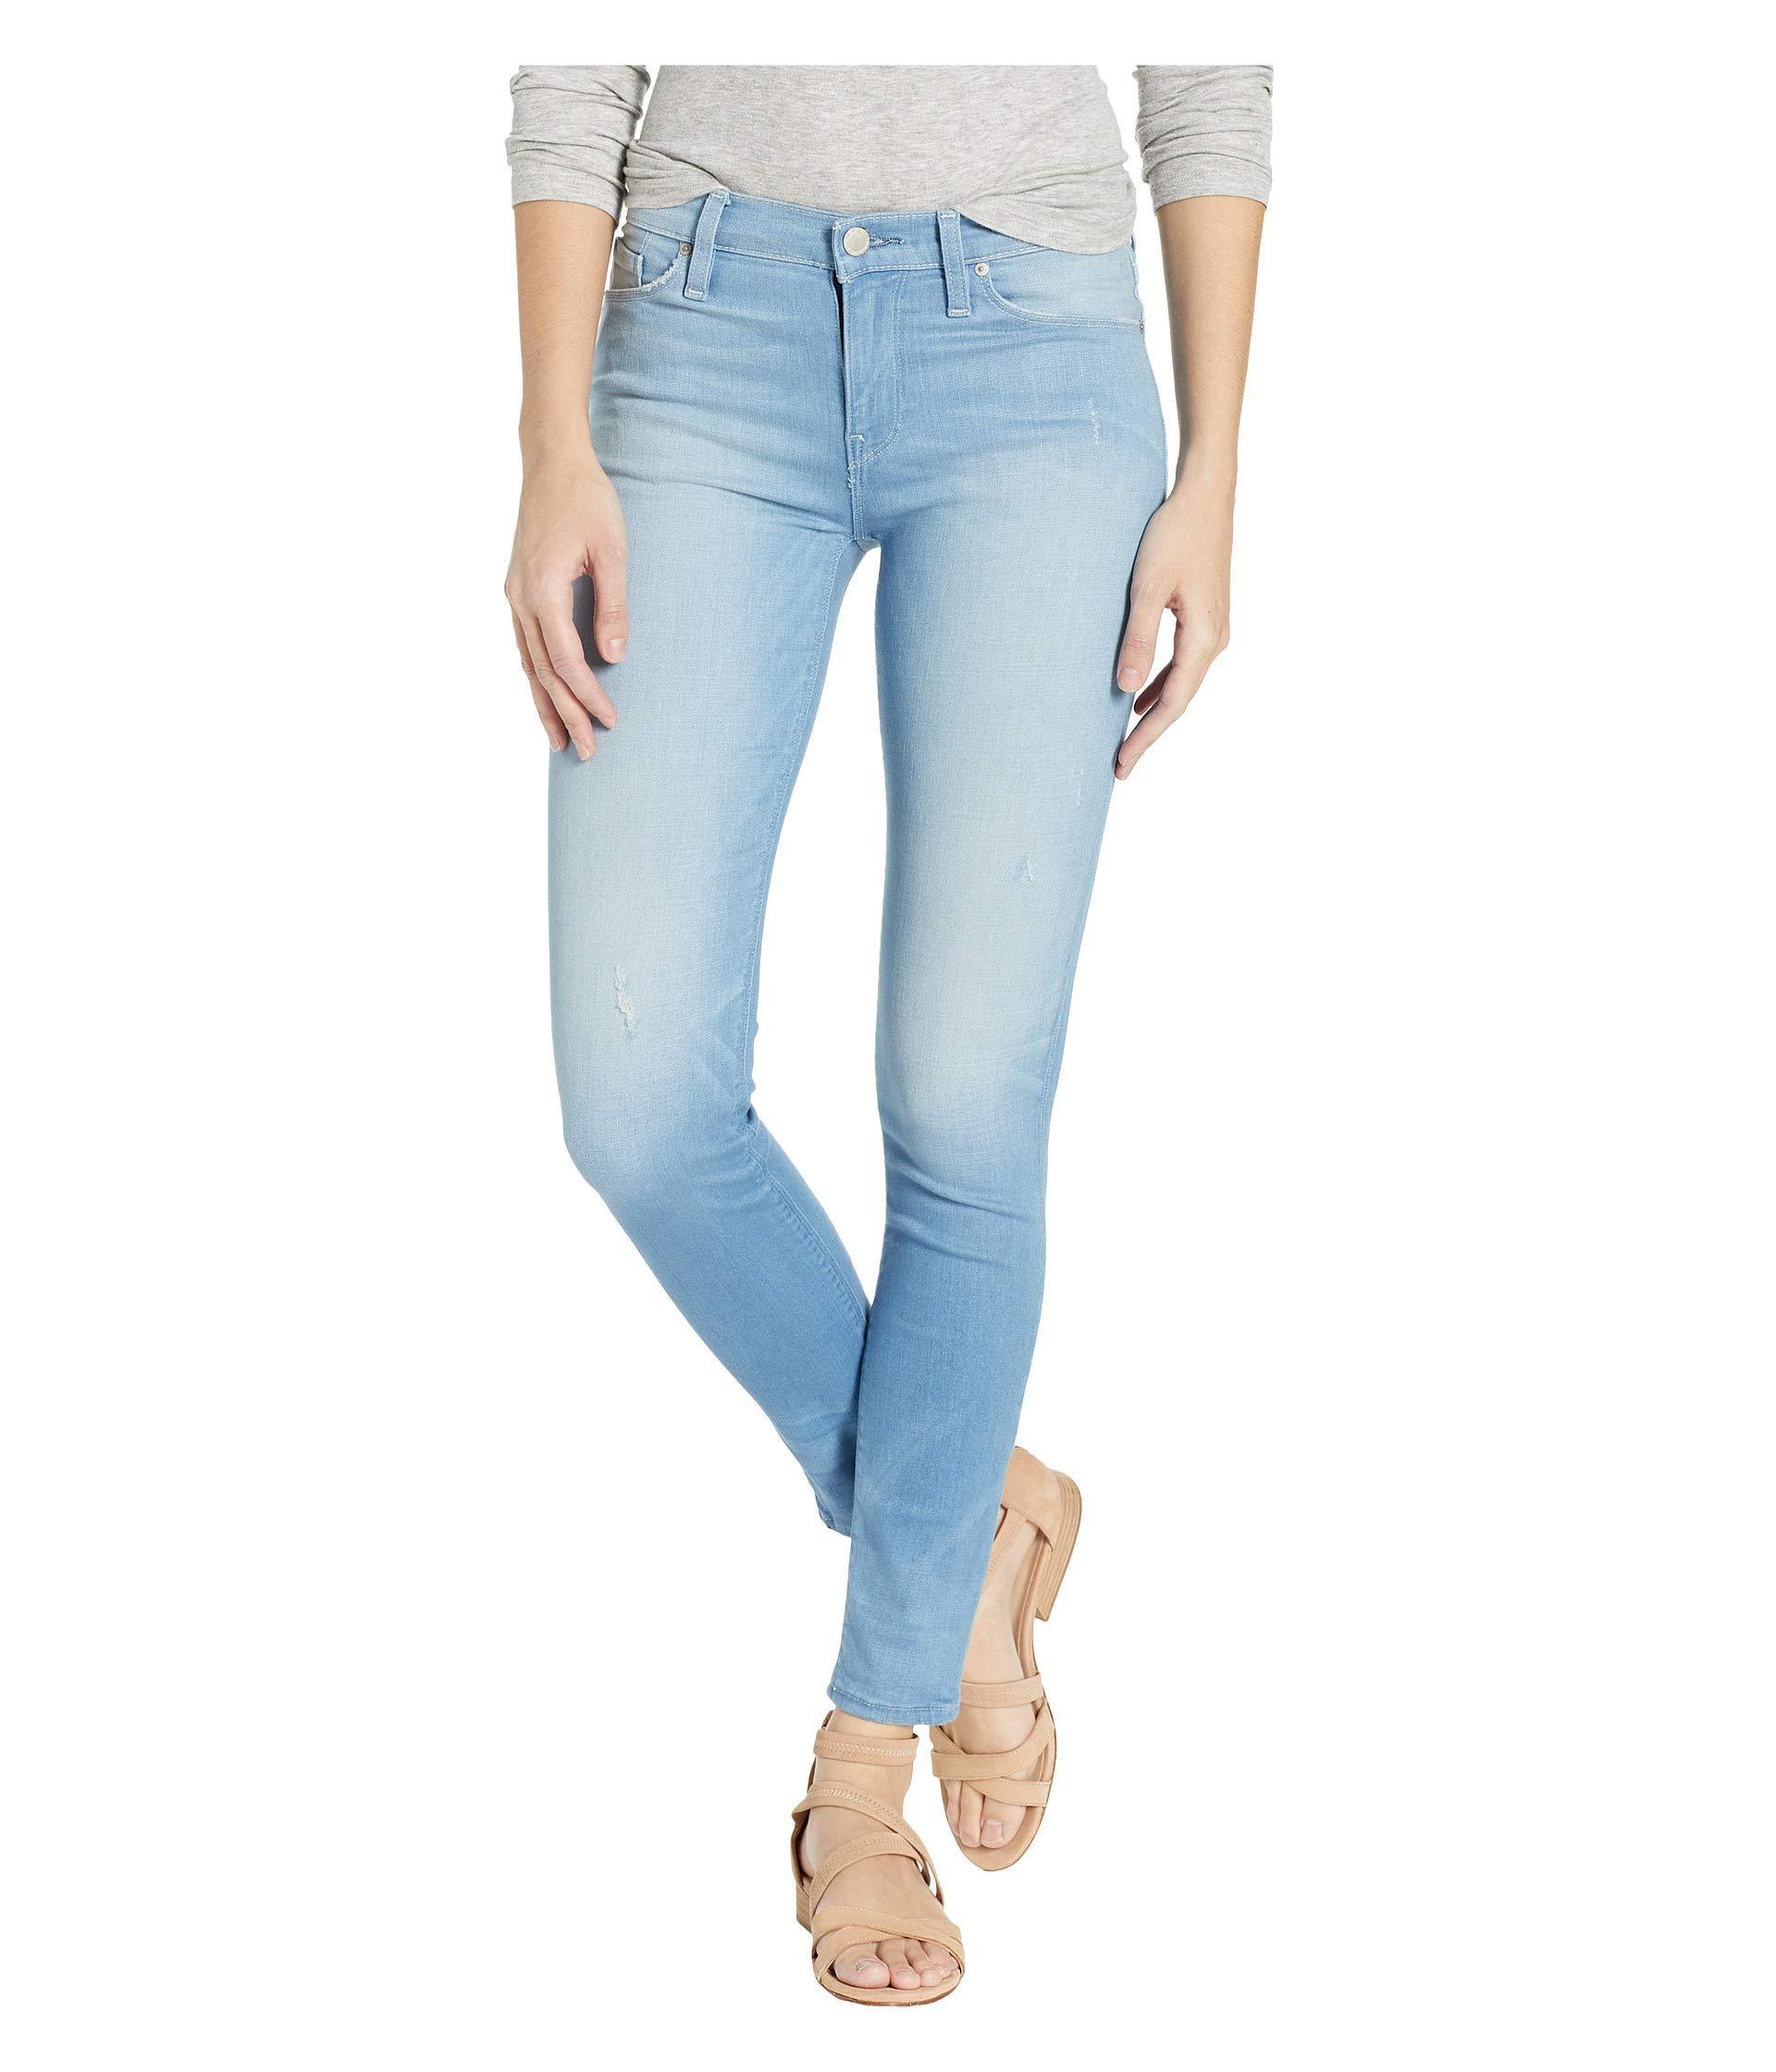 c68949ab879 Lyst - Hudson Jeans Nico Mid-rise Super Skinny In Worn Dream Away ...